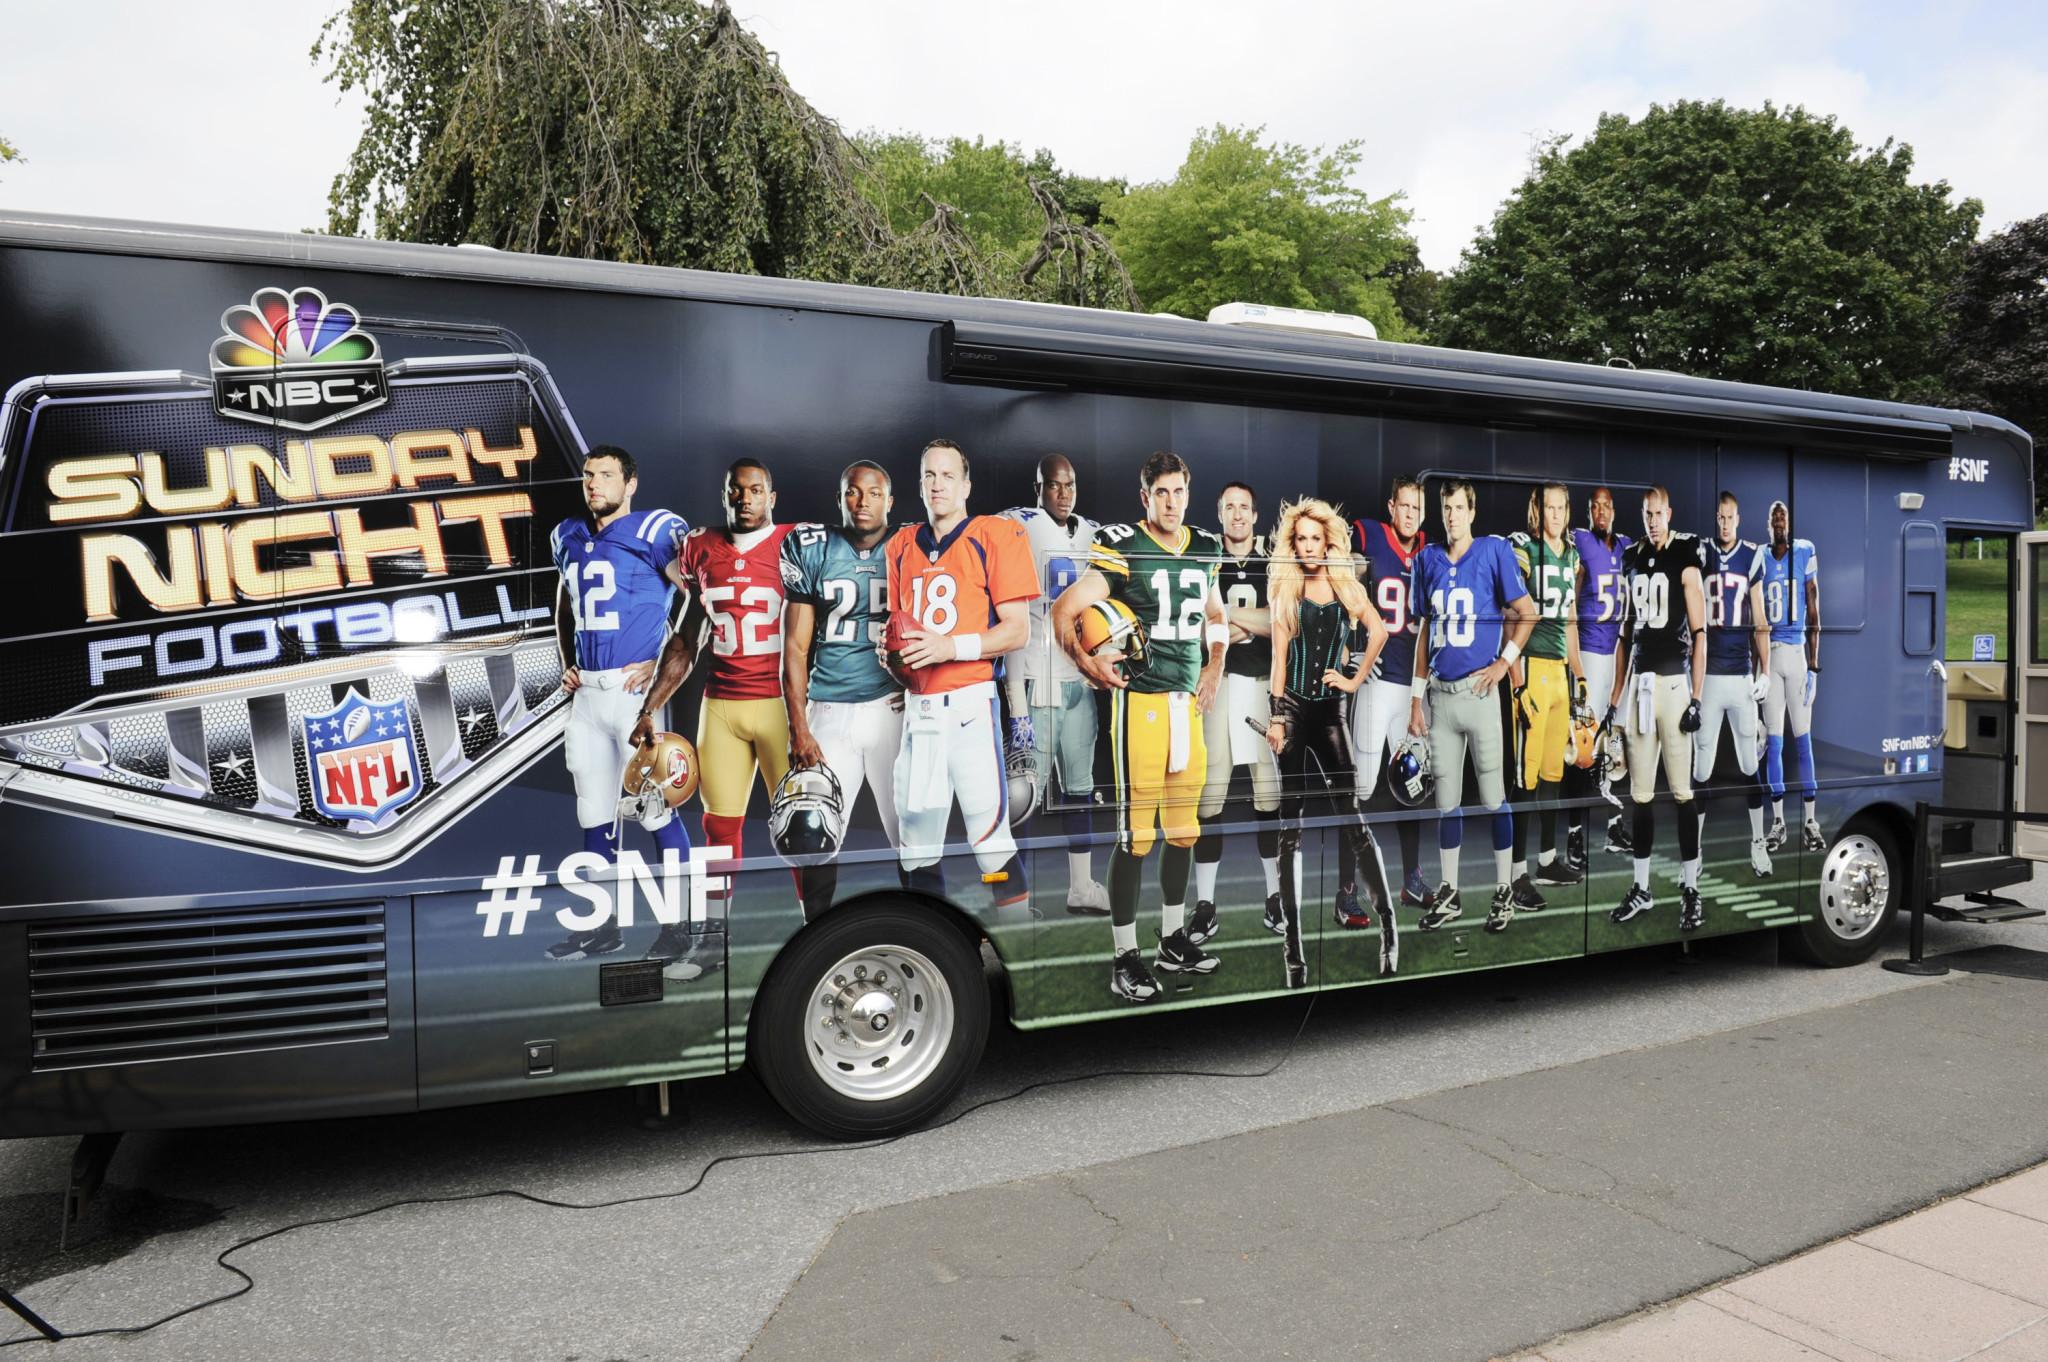 Inside NBC's Sunday Night Football Tour